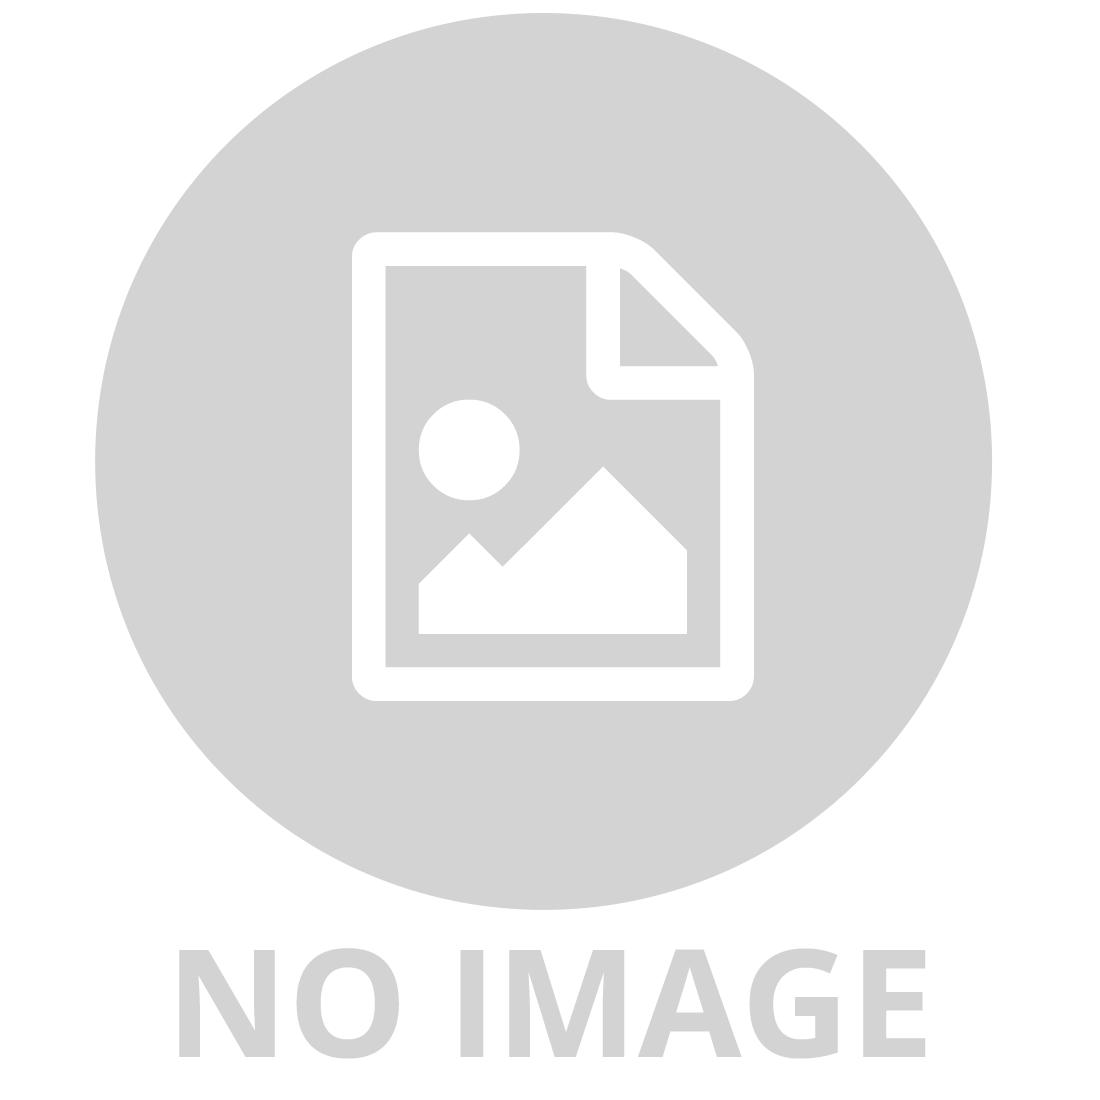 WOOD WORX MOTORBIKE KIT